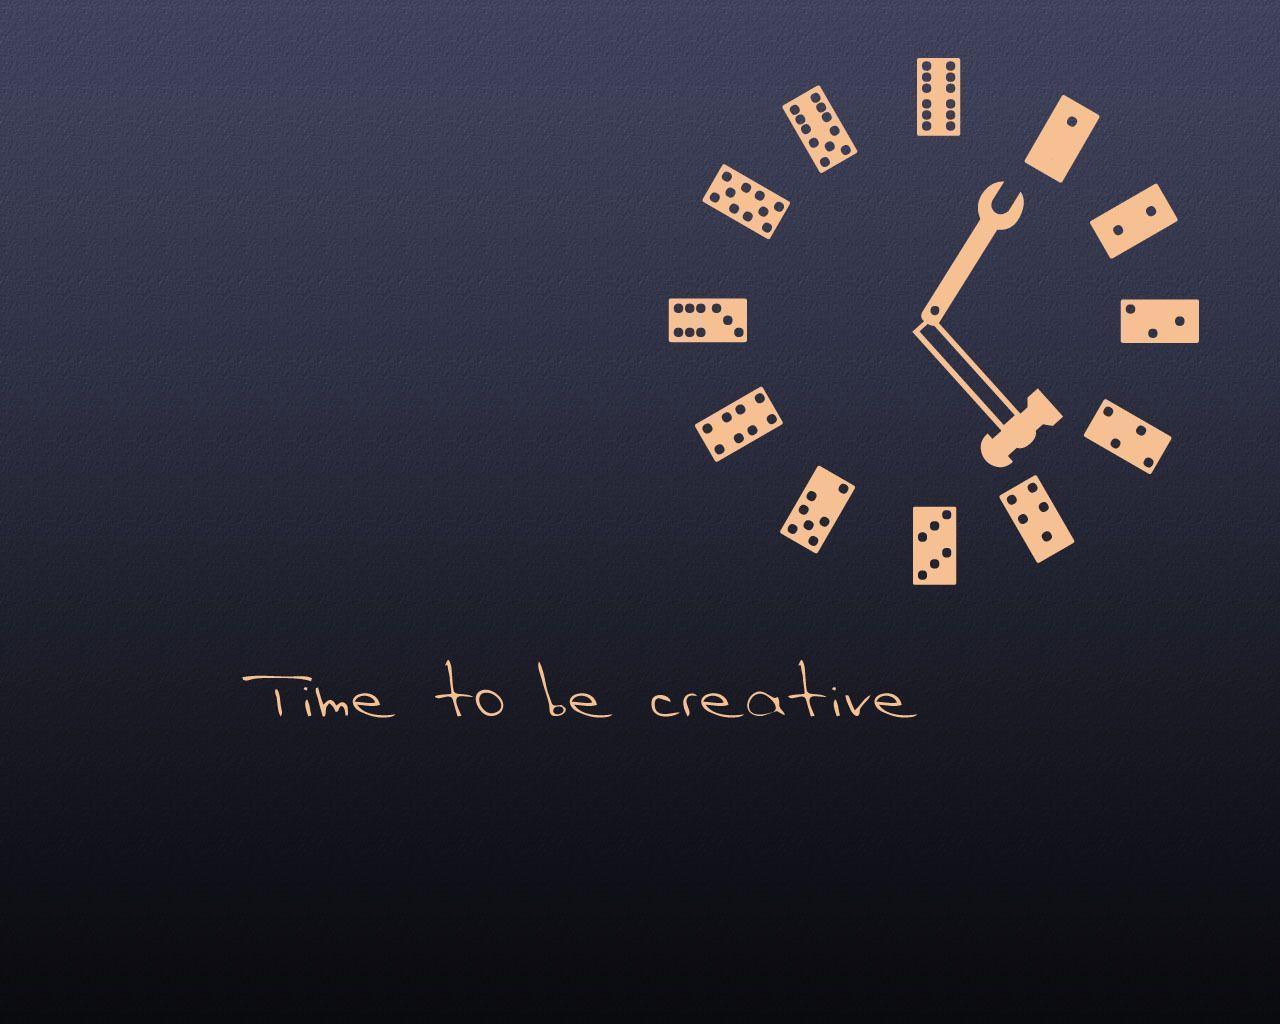 creativity wallpapers - wallpaper cave